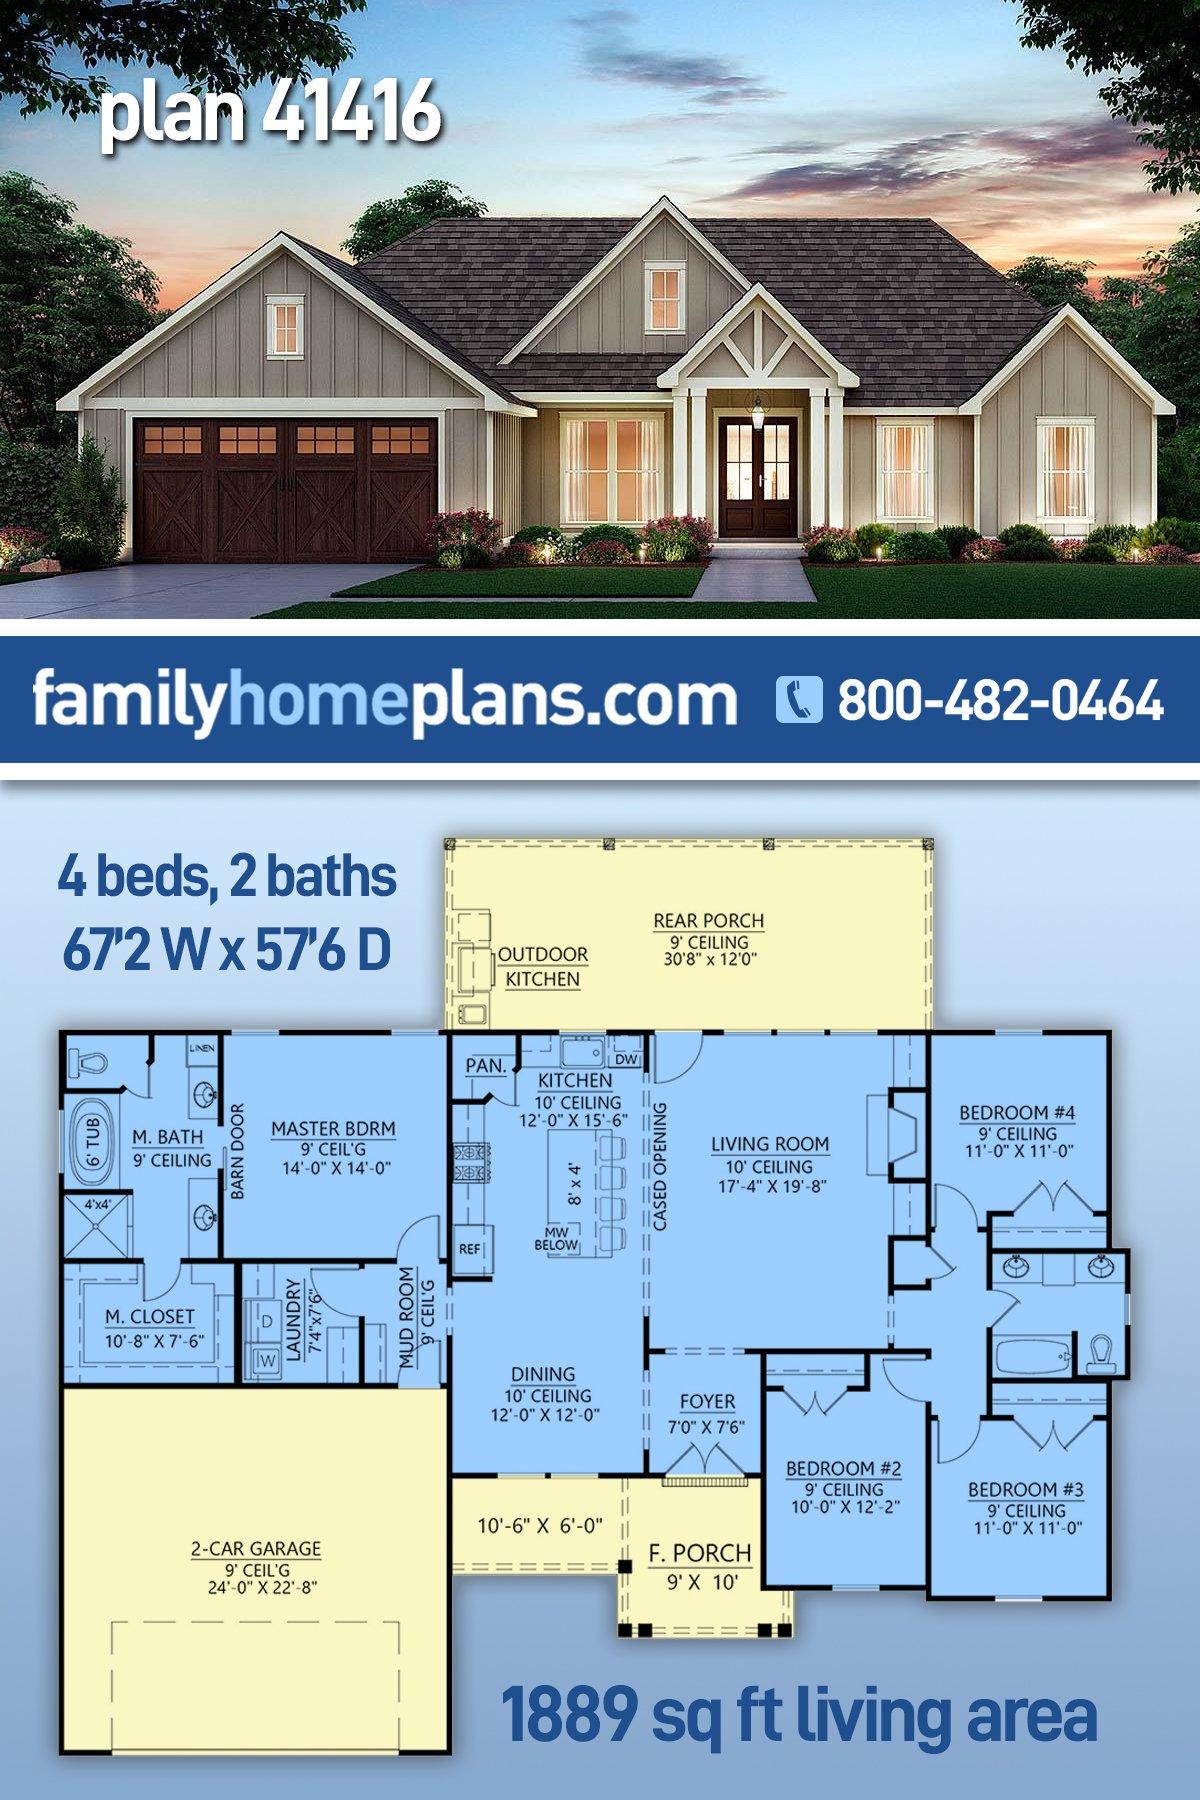 Craftsman, Farmhouse House Plan 41416 with 4 Beds, 2 Baths, 2 Car Garage